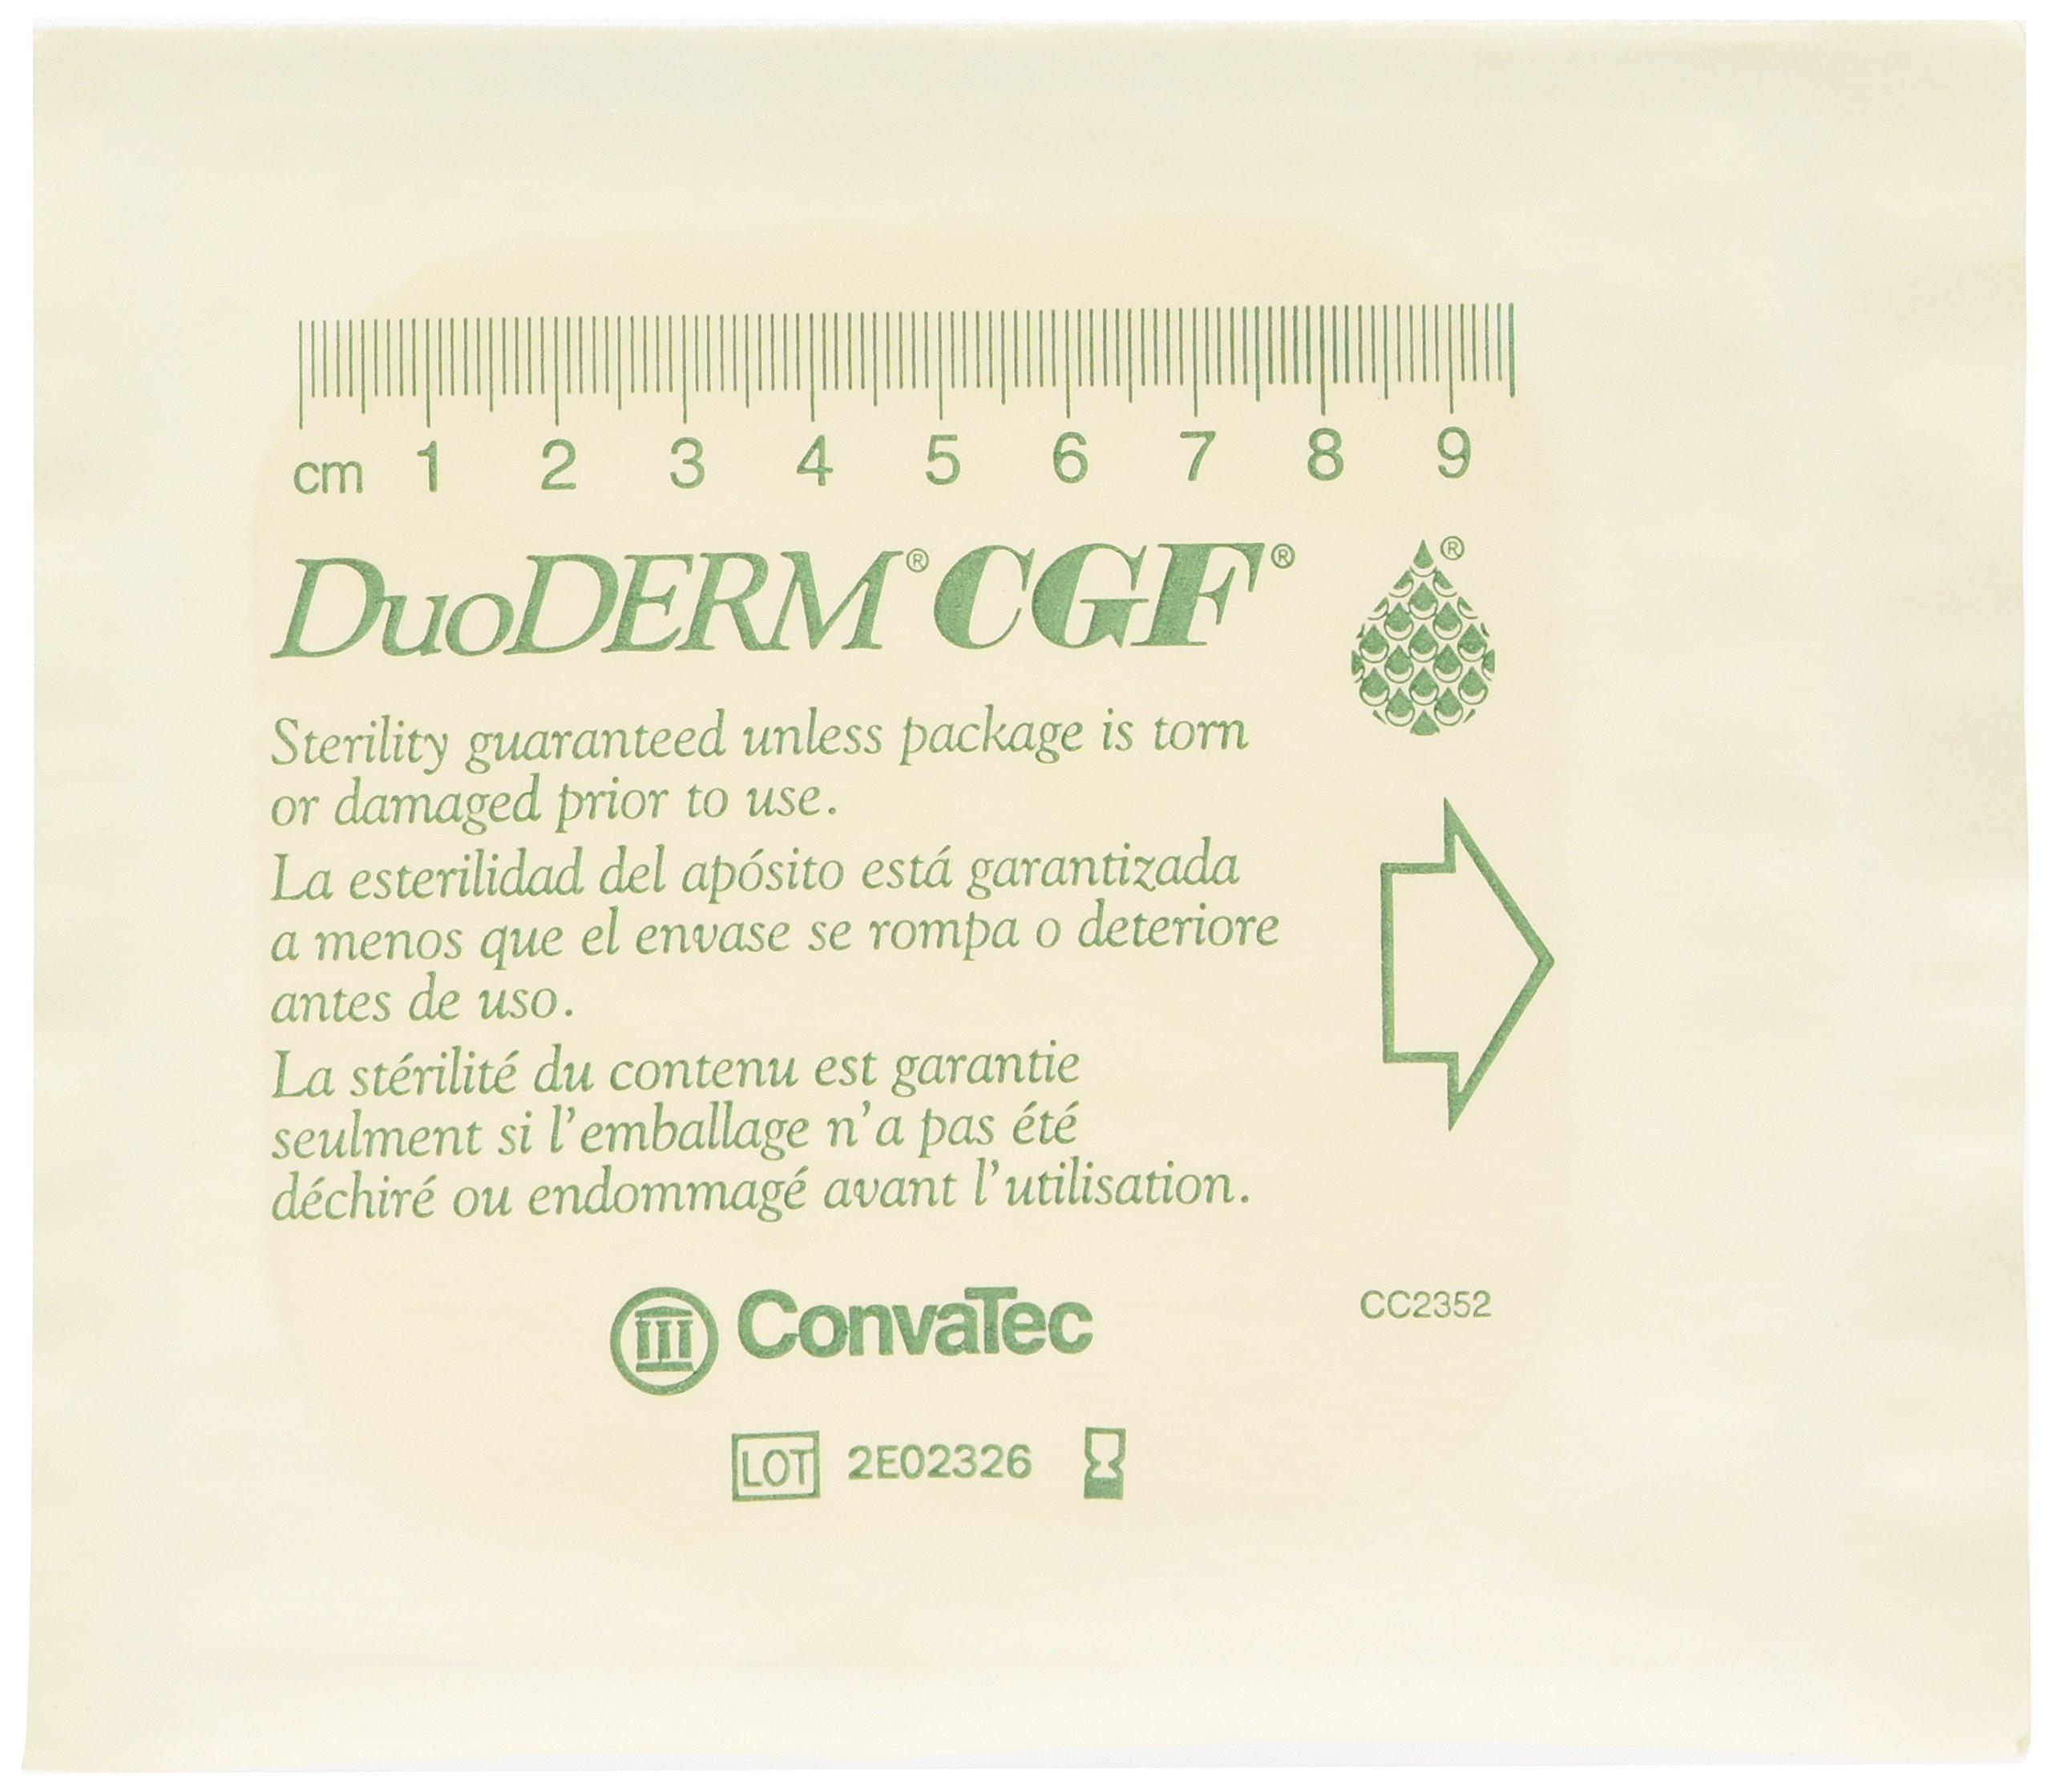 DUODERM CGF 4x4, Box of 5, 187660